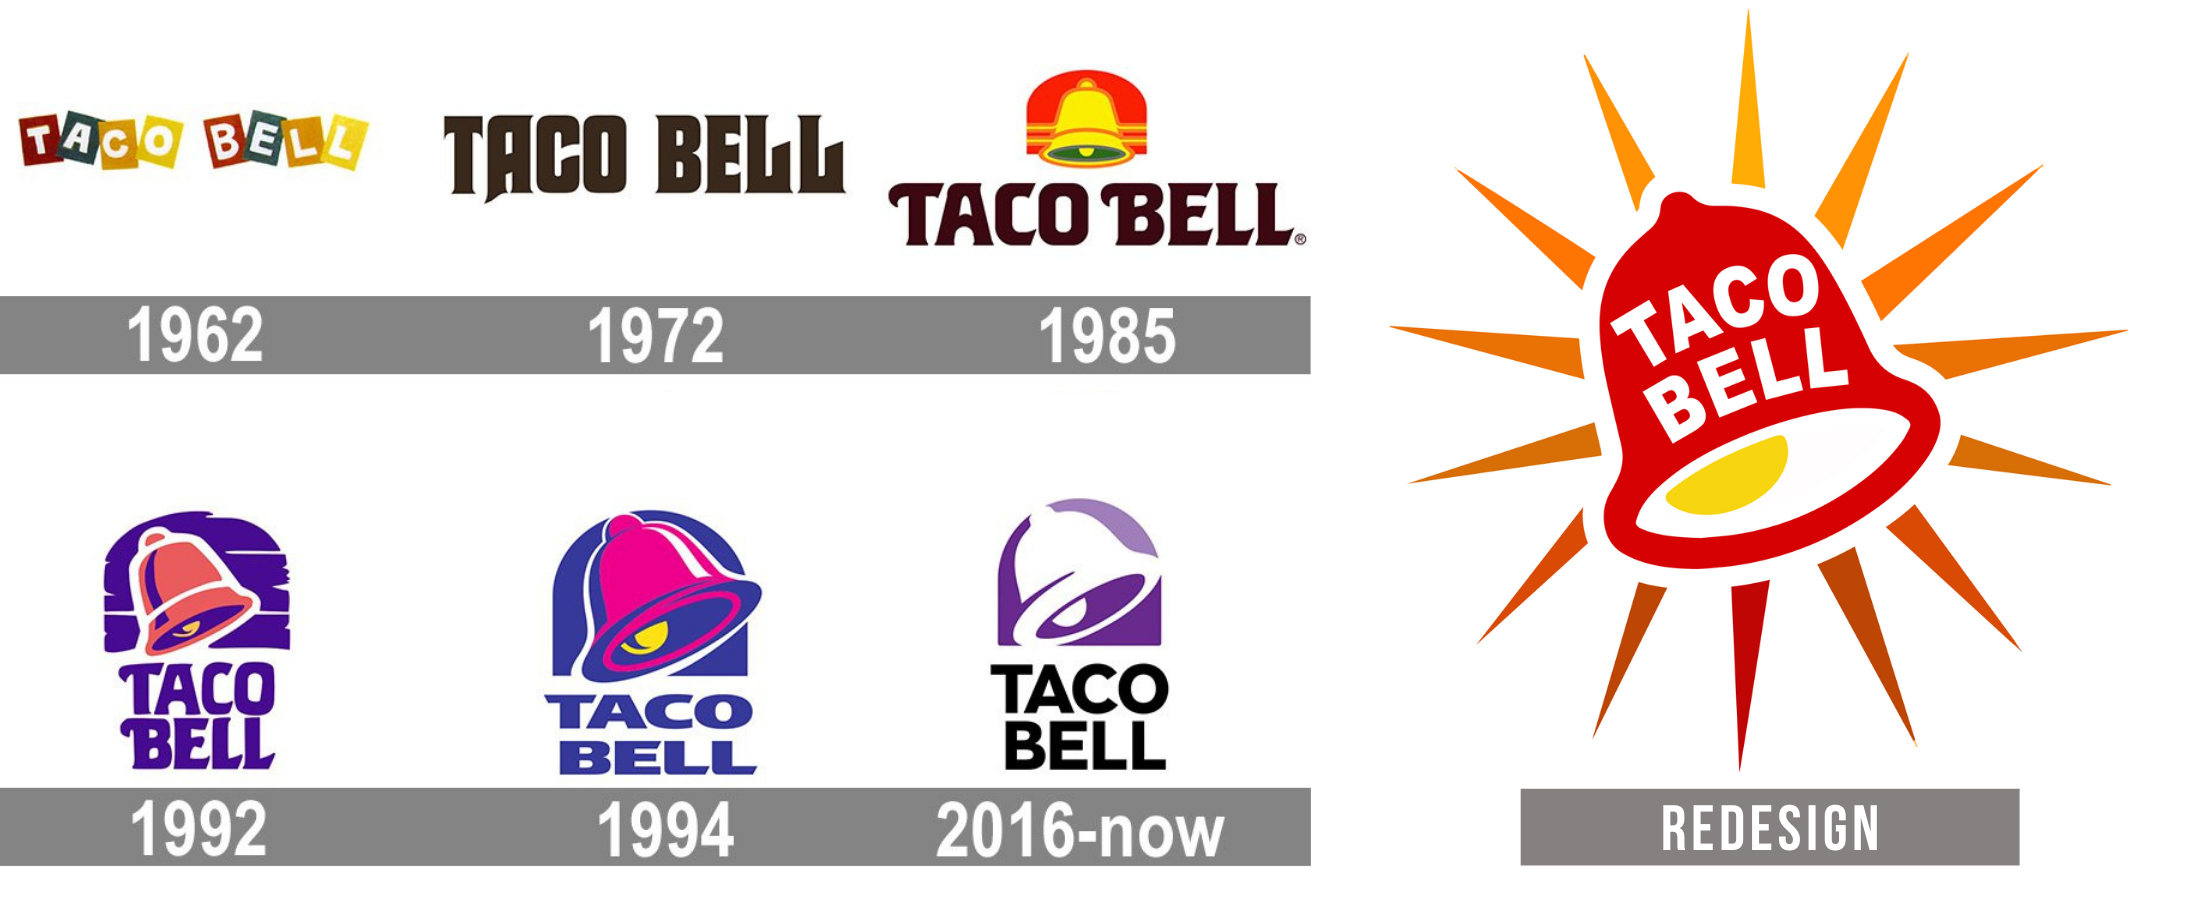 Taco Bell Logo Redesign